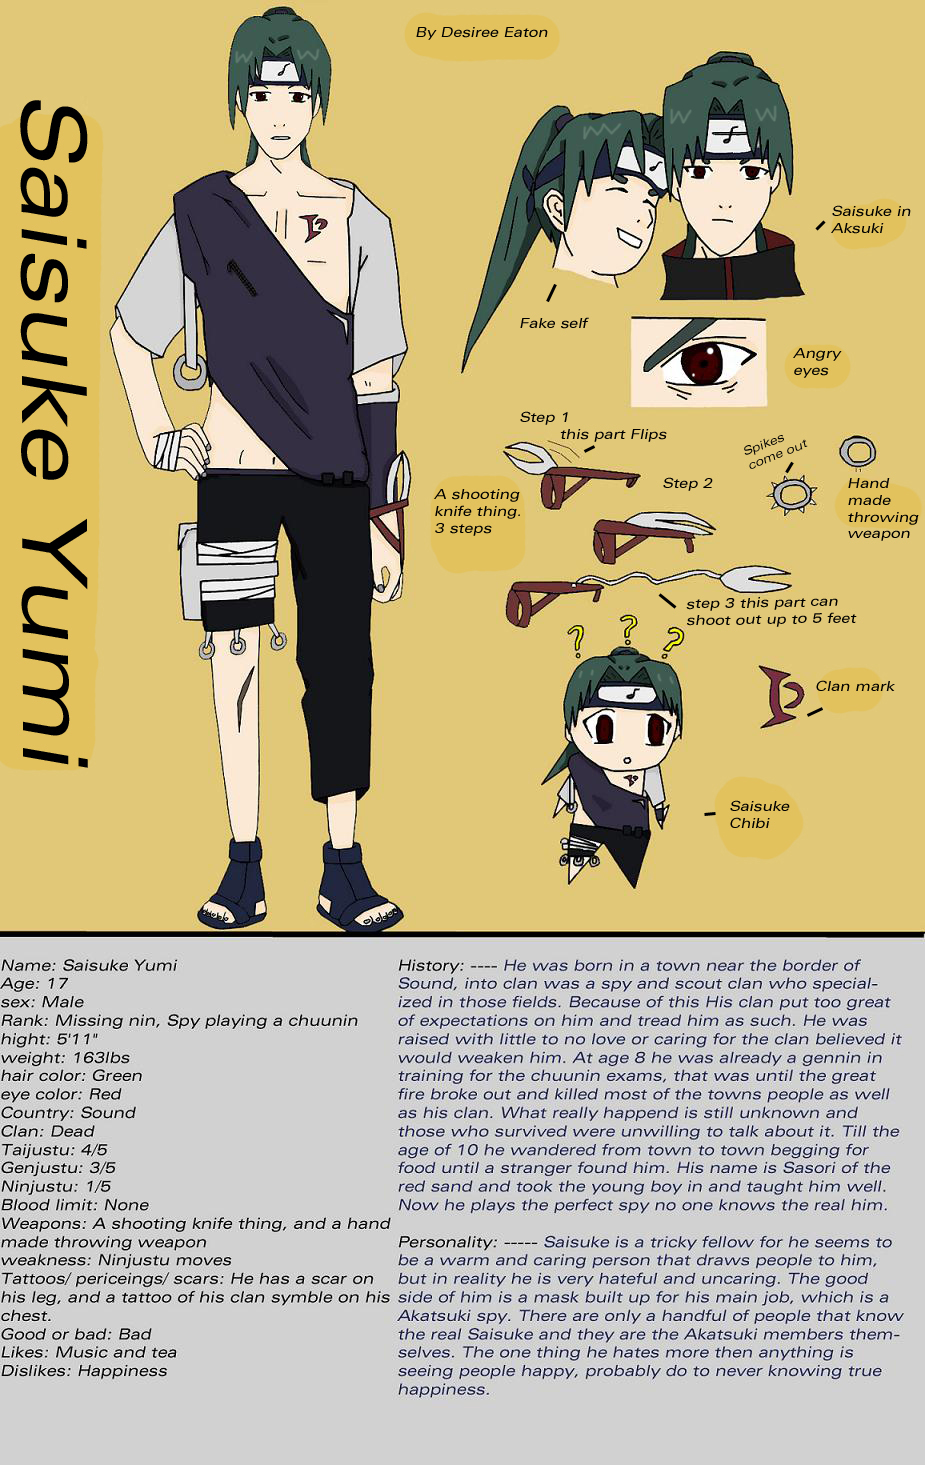 Naruto OC character sheet by Desicat674